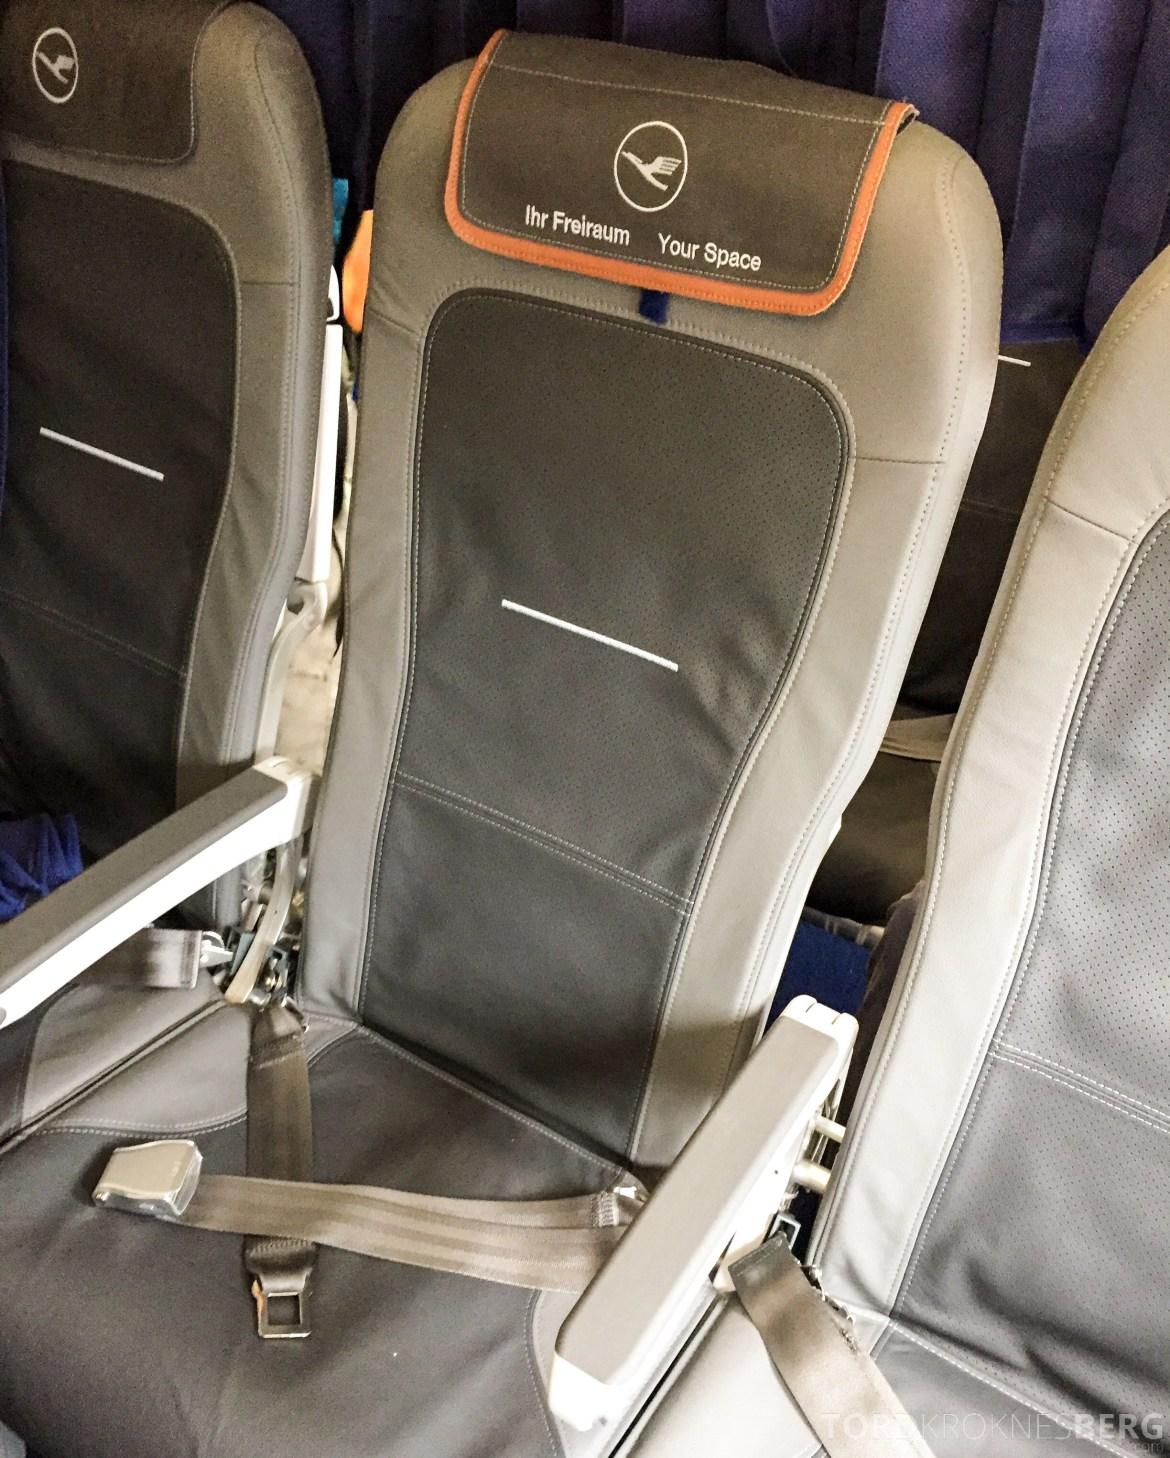 Lufthansa Business Class i Europa fra Oslo til München sete